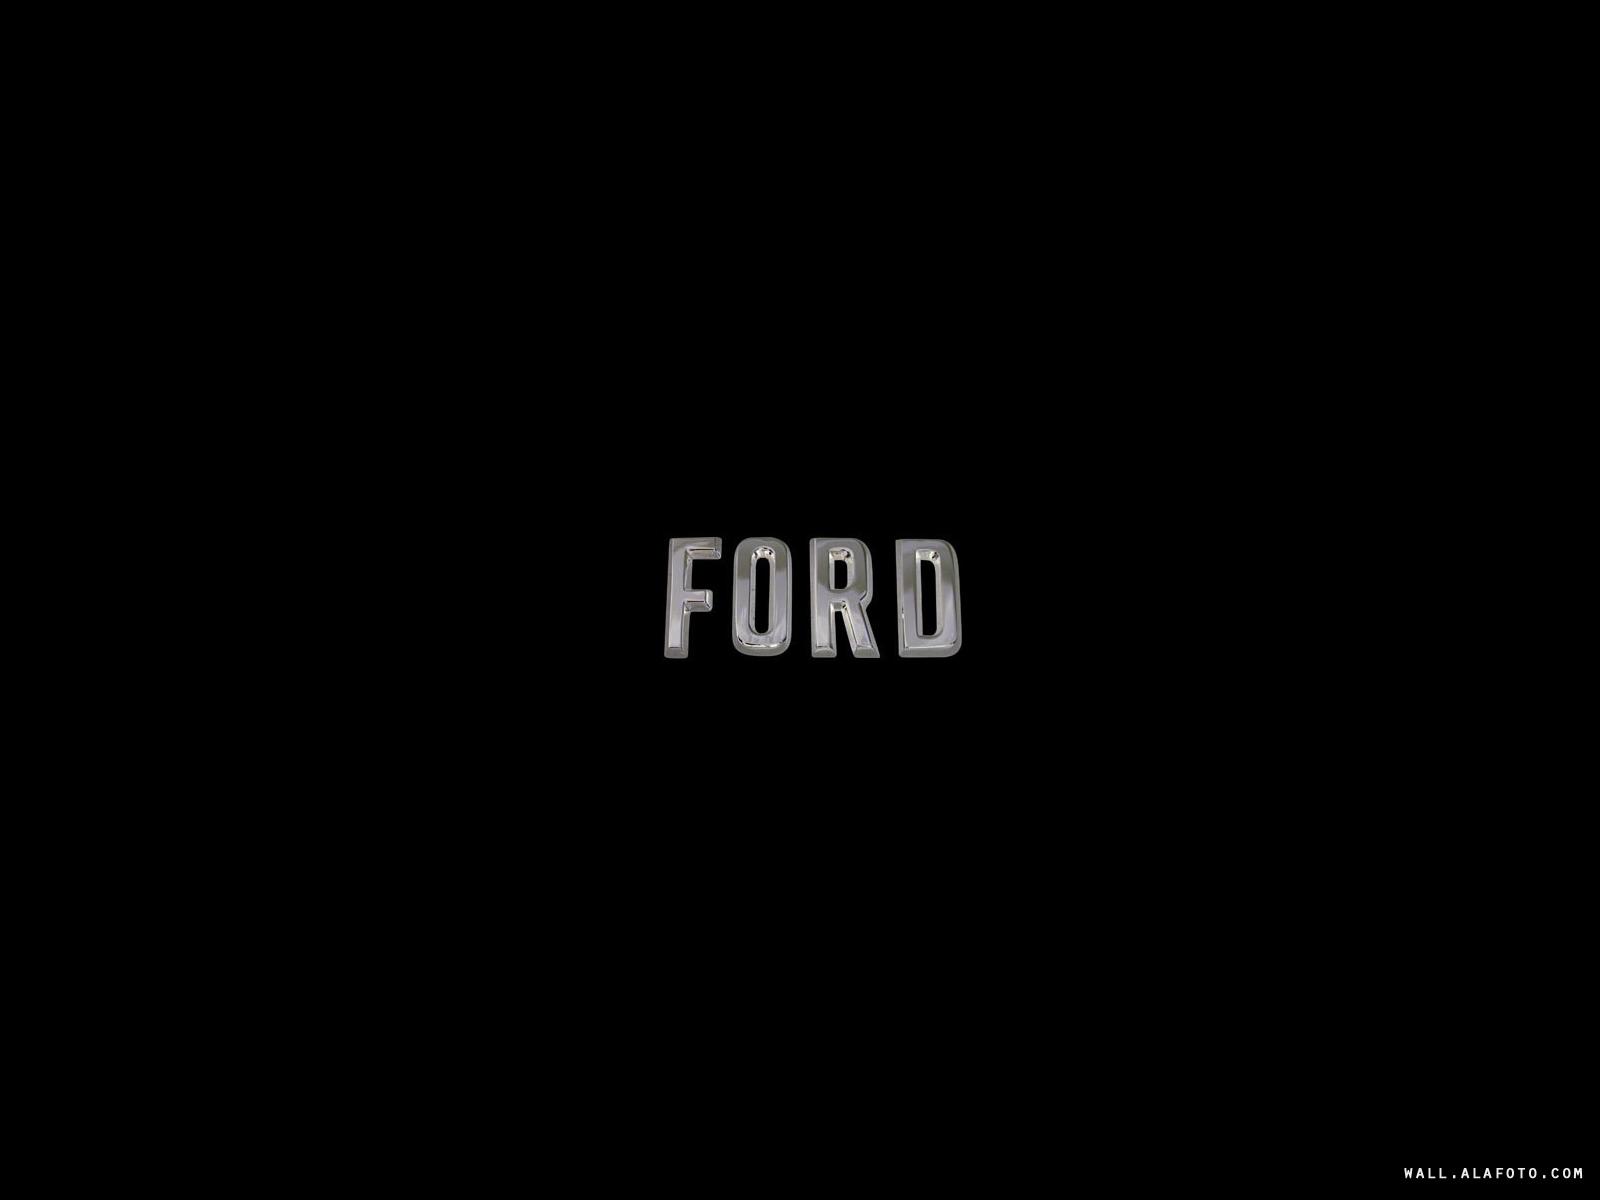 Ford Cars Logos   Ford logo 101   Alafoto Wallpapers 1600x1200